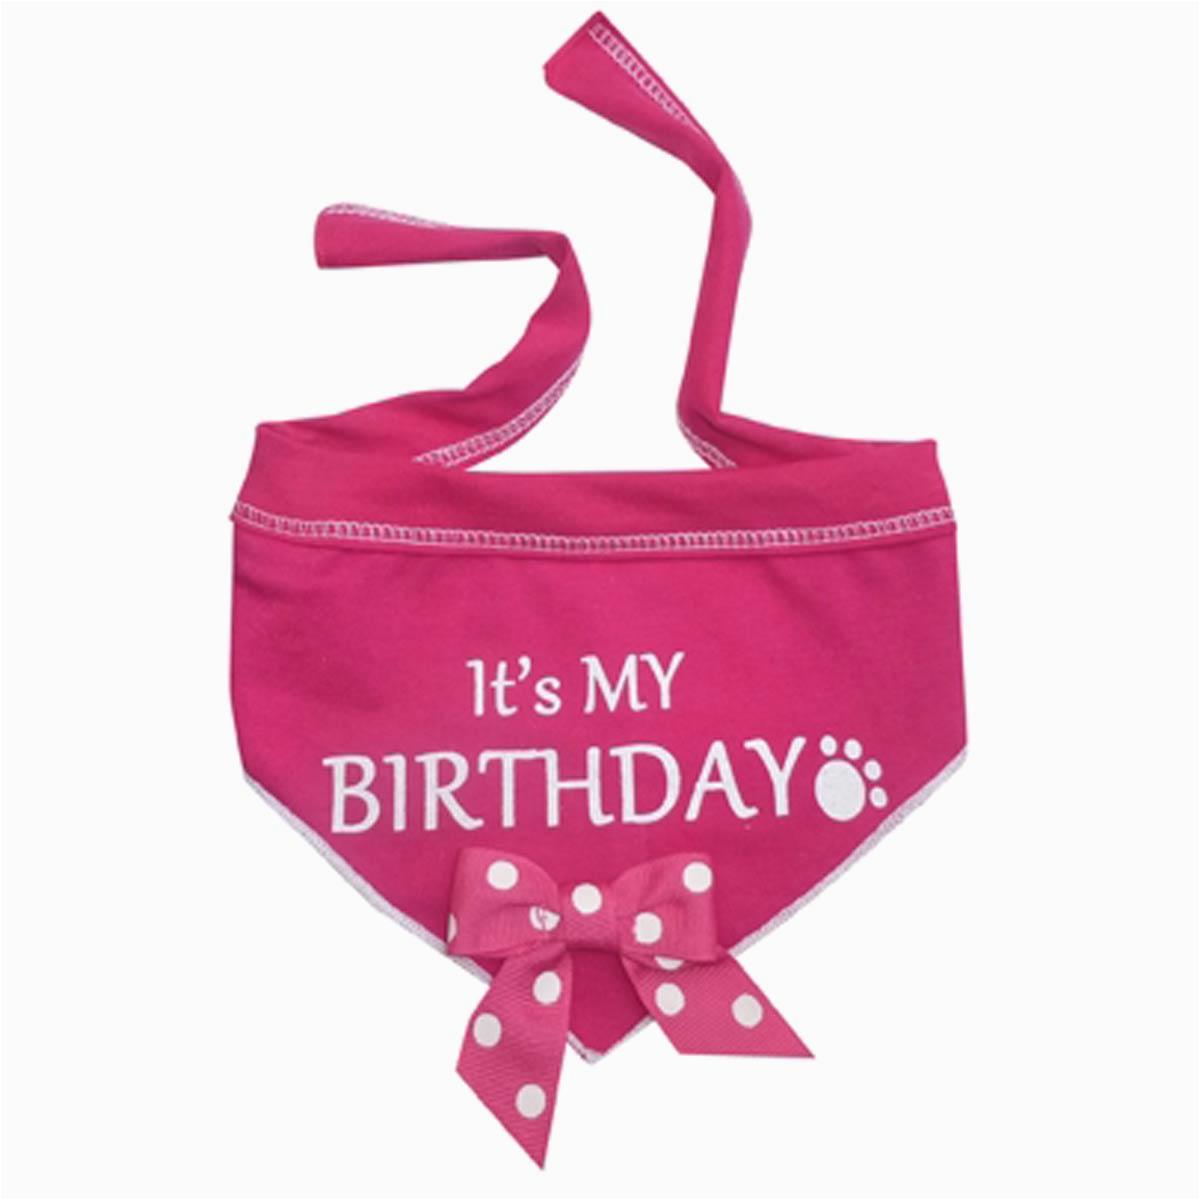 Birthday Girl Dog Bandana It 39 S My Birthday Dog Bandana Scarf Pink with Same Day